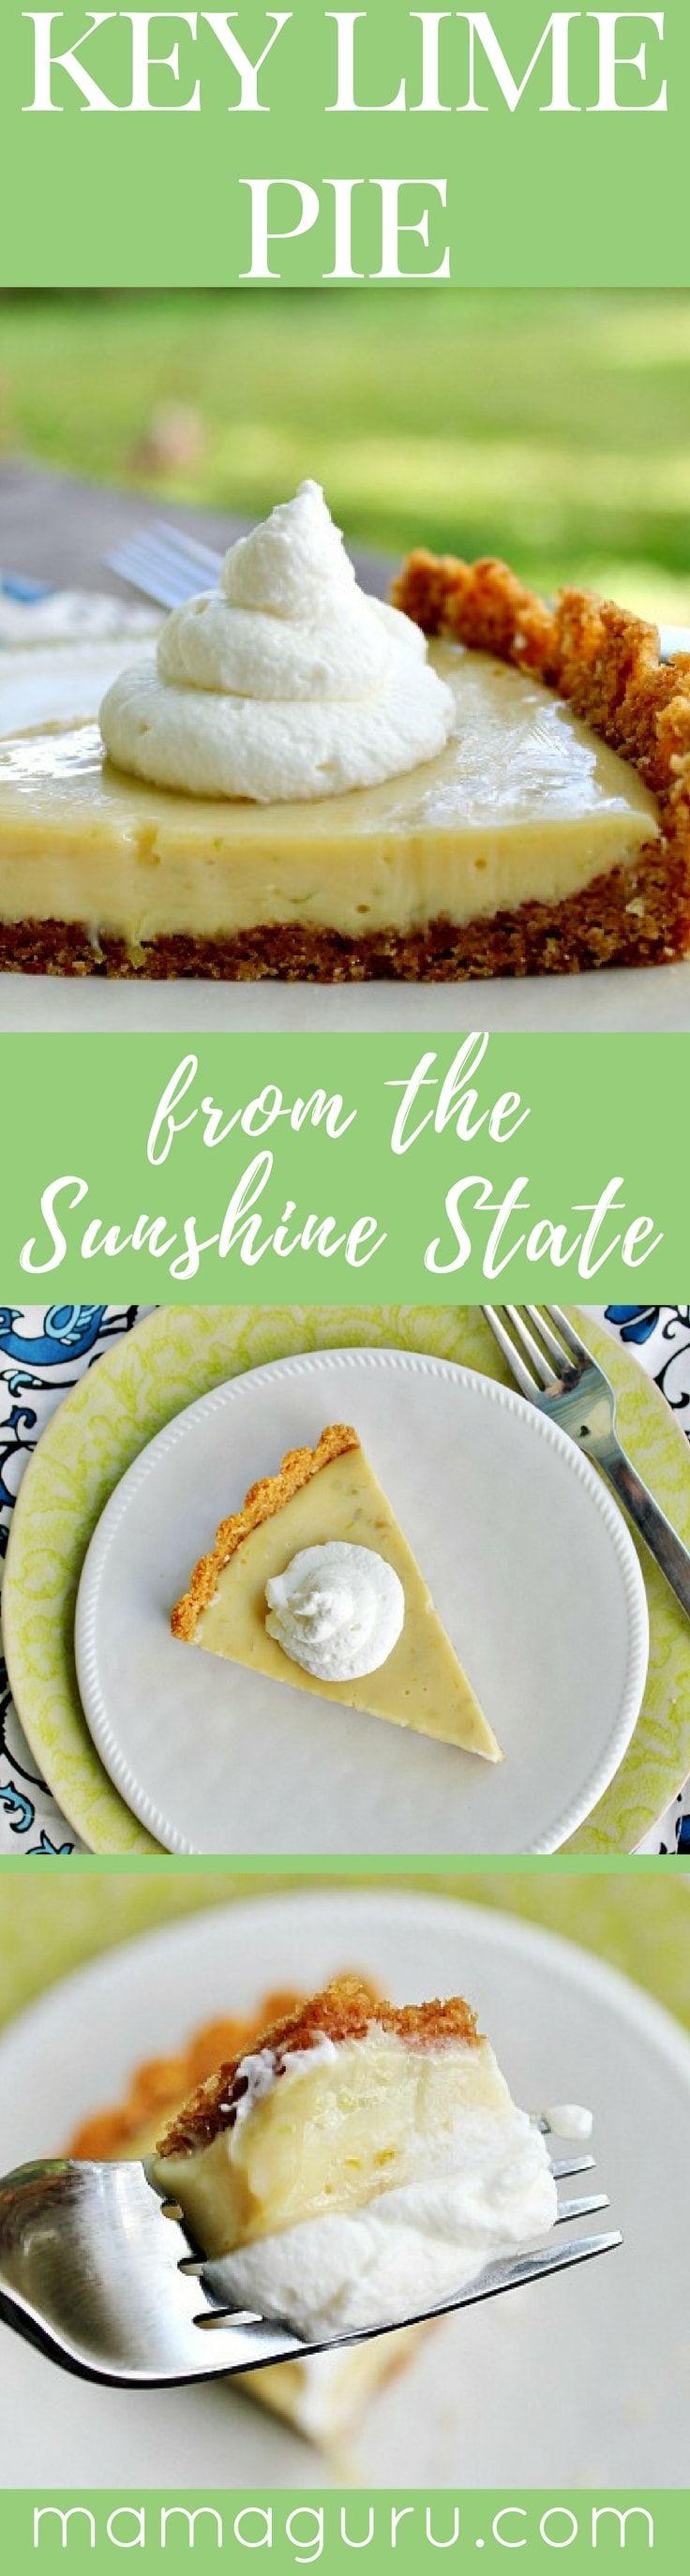 Key Lime Pie ♥ Dessert ♥ Graham Cracker Crust ♥ Citrus ♥ Florida